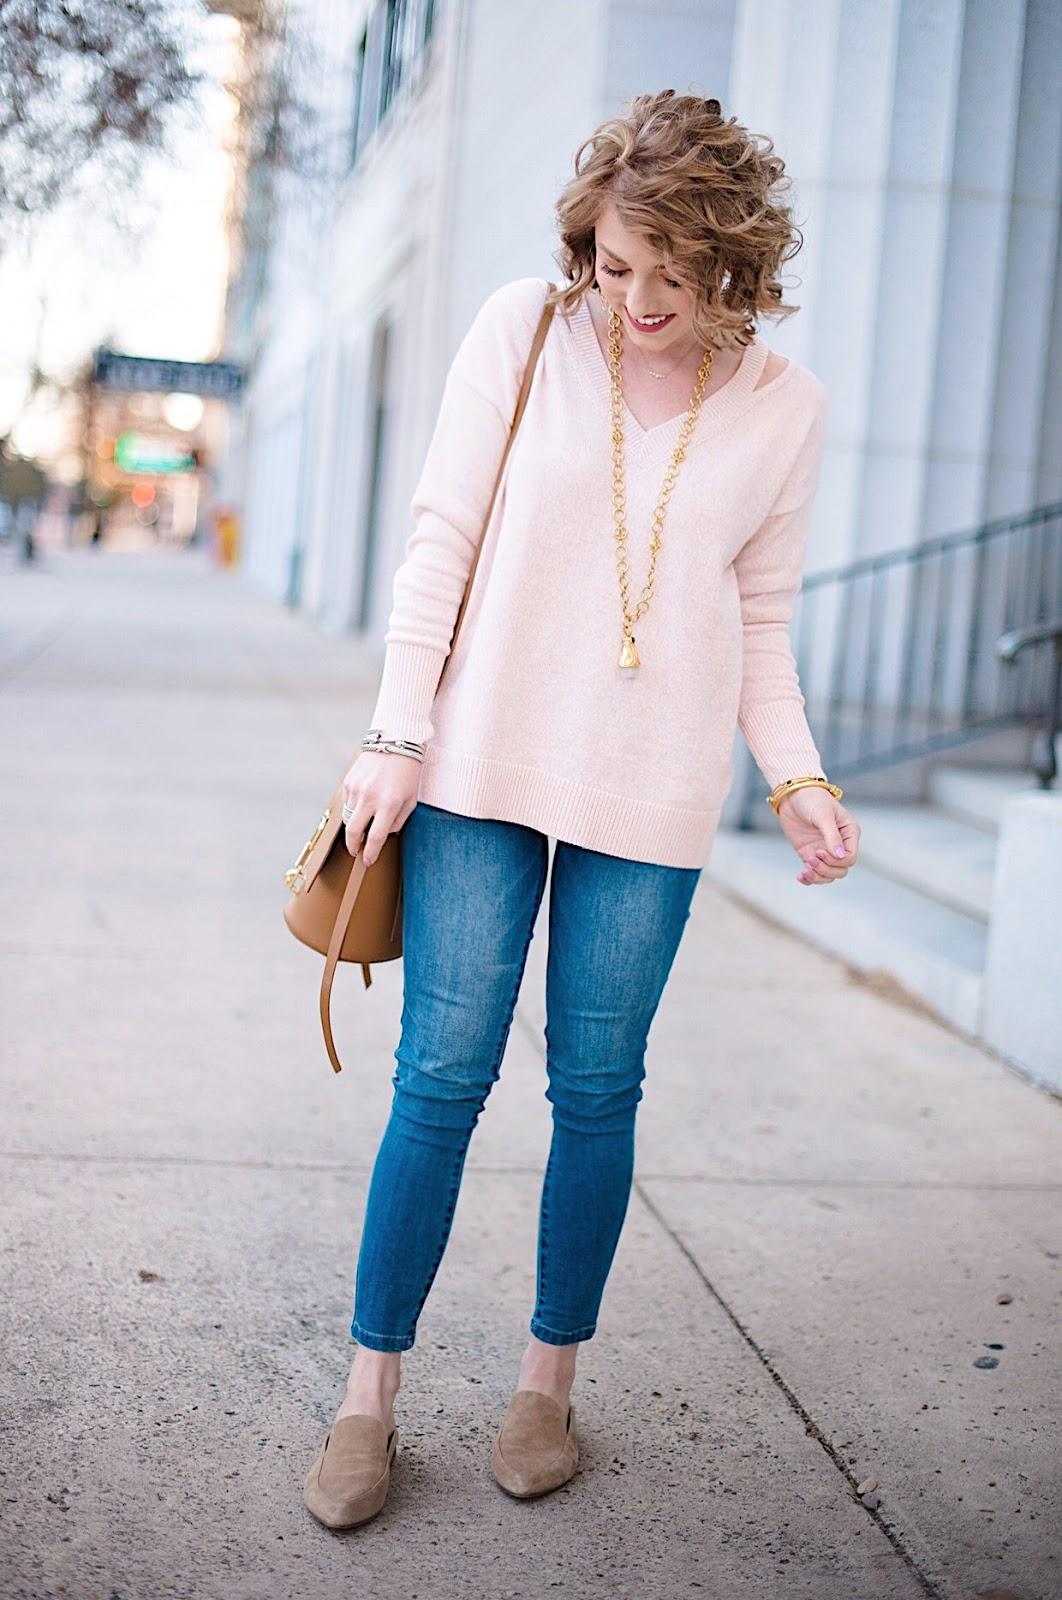 Everyday Winter Style - Something Delightful Blog